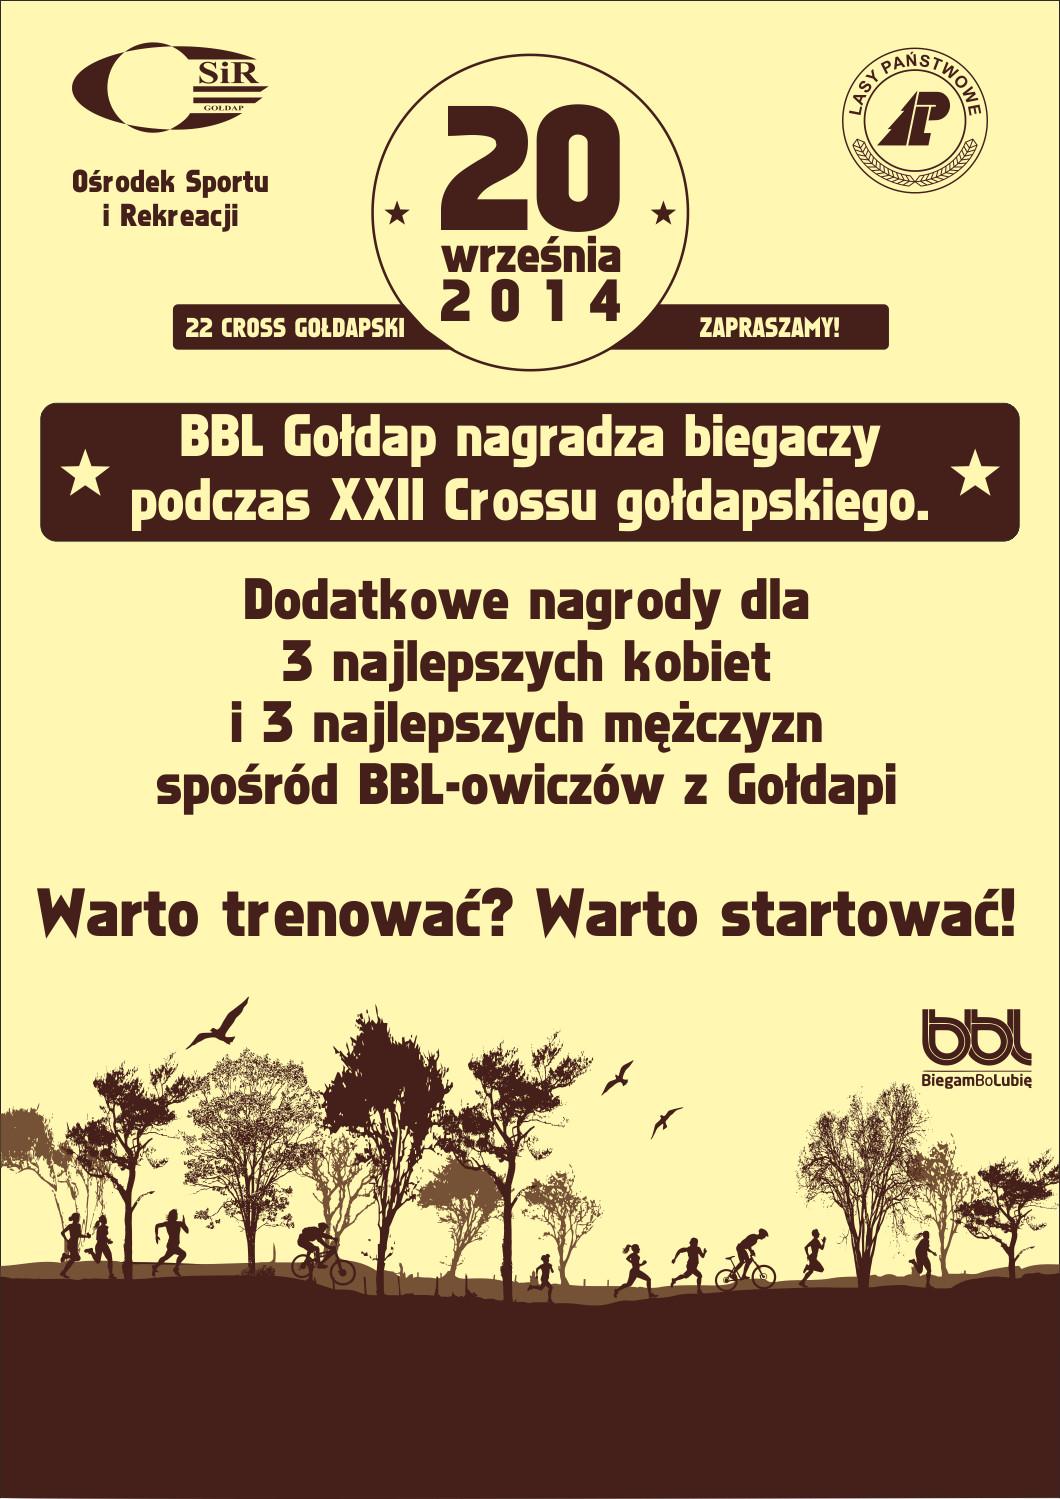 bbl_nagradza